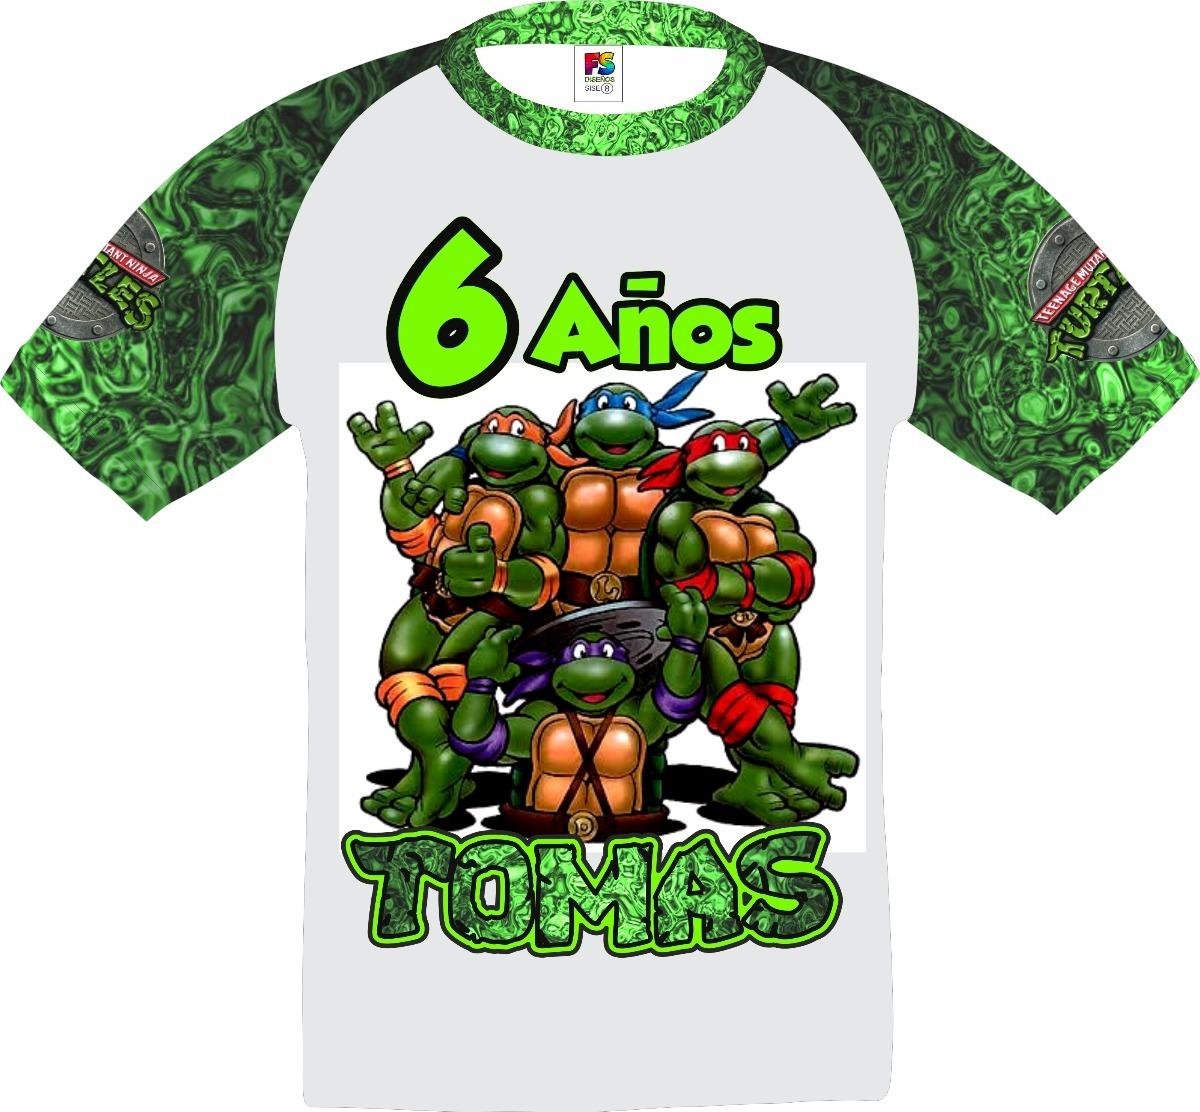 97f42fad5c Tortugas Ninja Franela Personalizadas Cumpleaños Fiestas - Bs. 2.200 ...